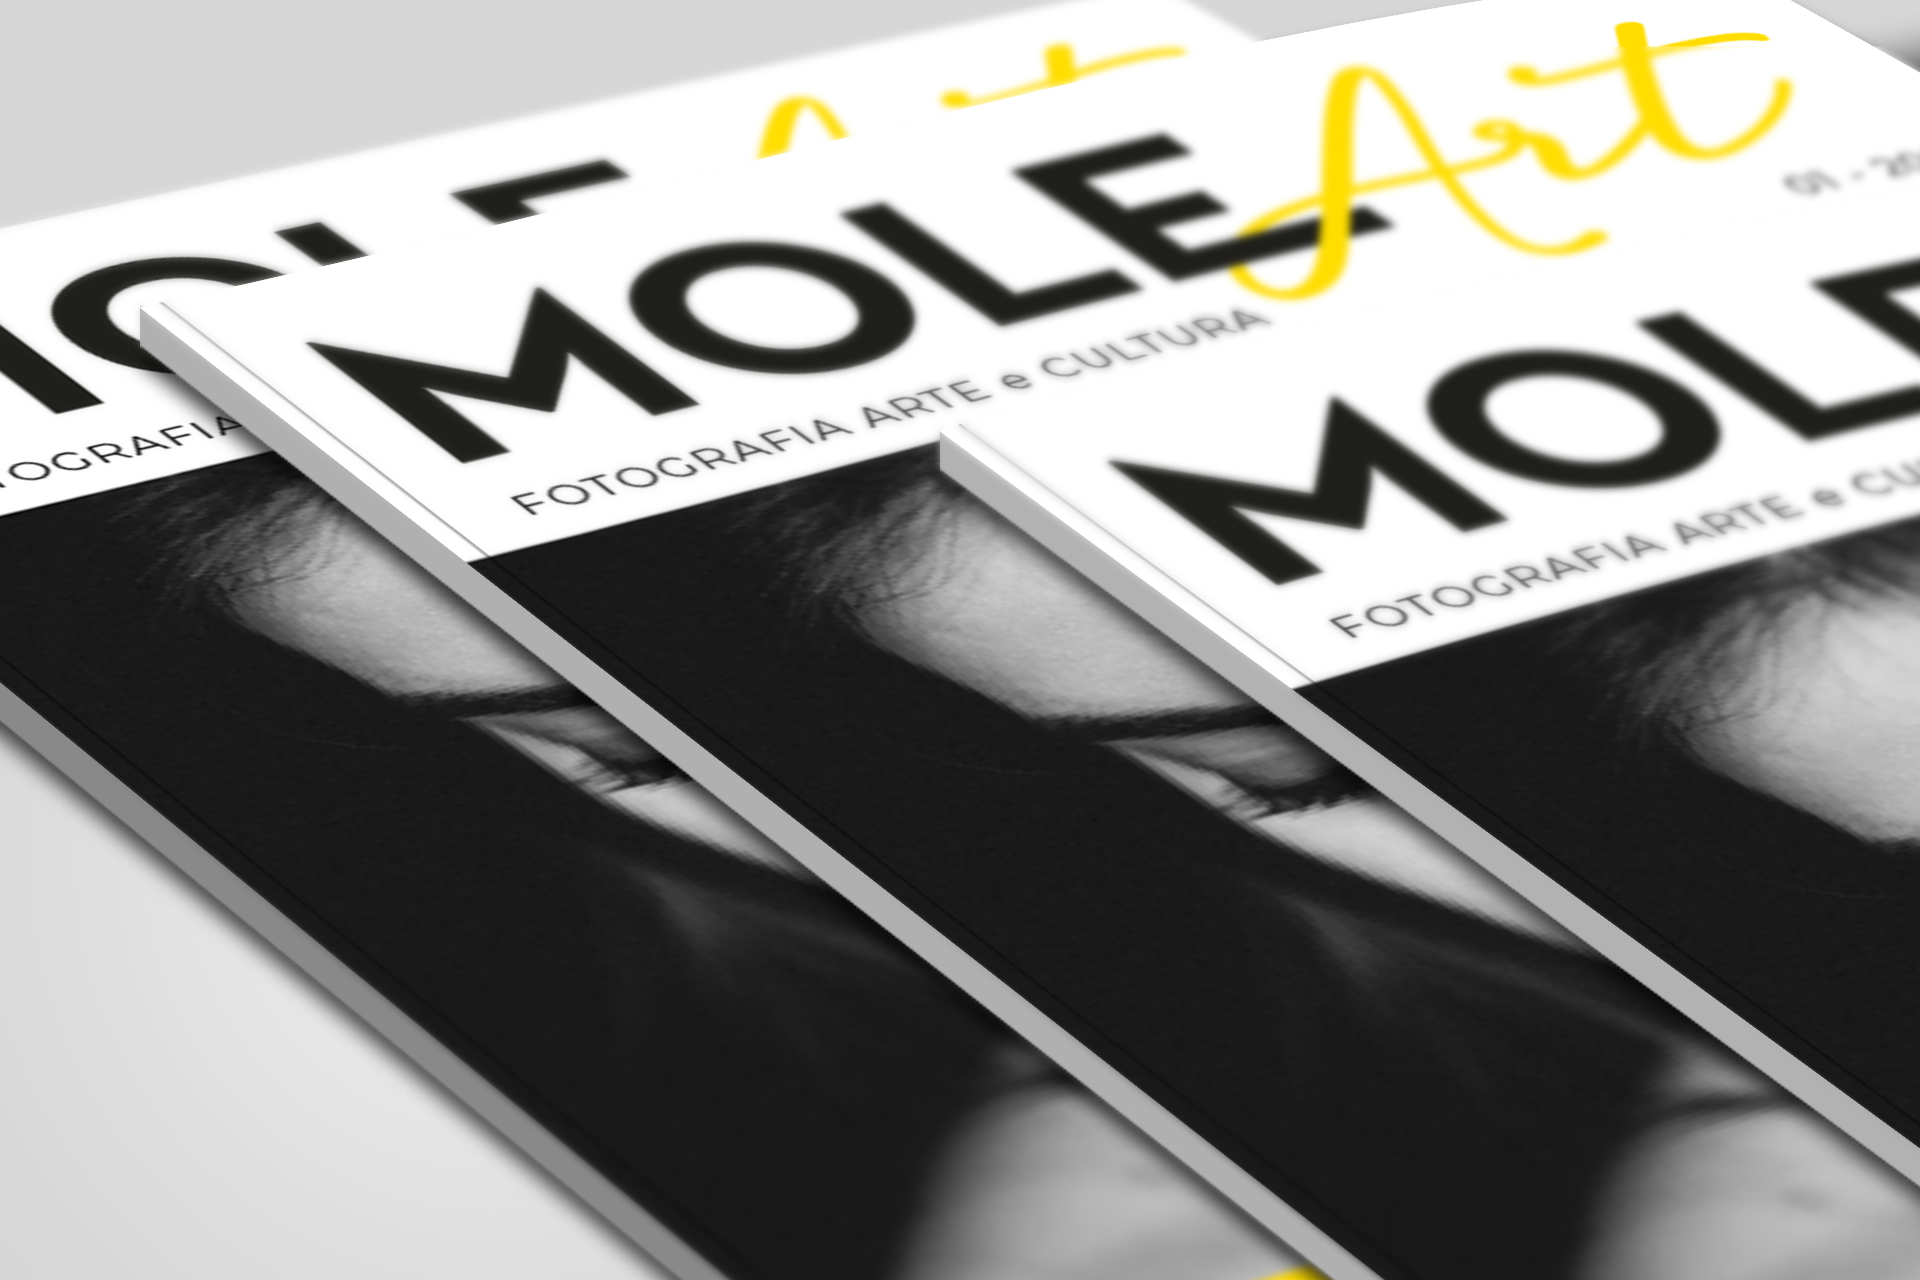 MOLEArt